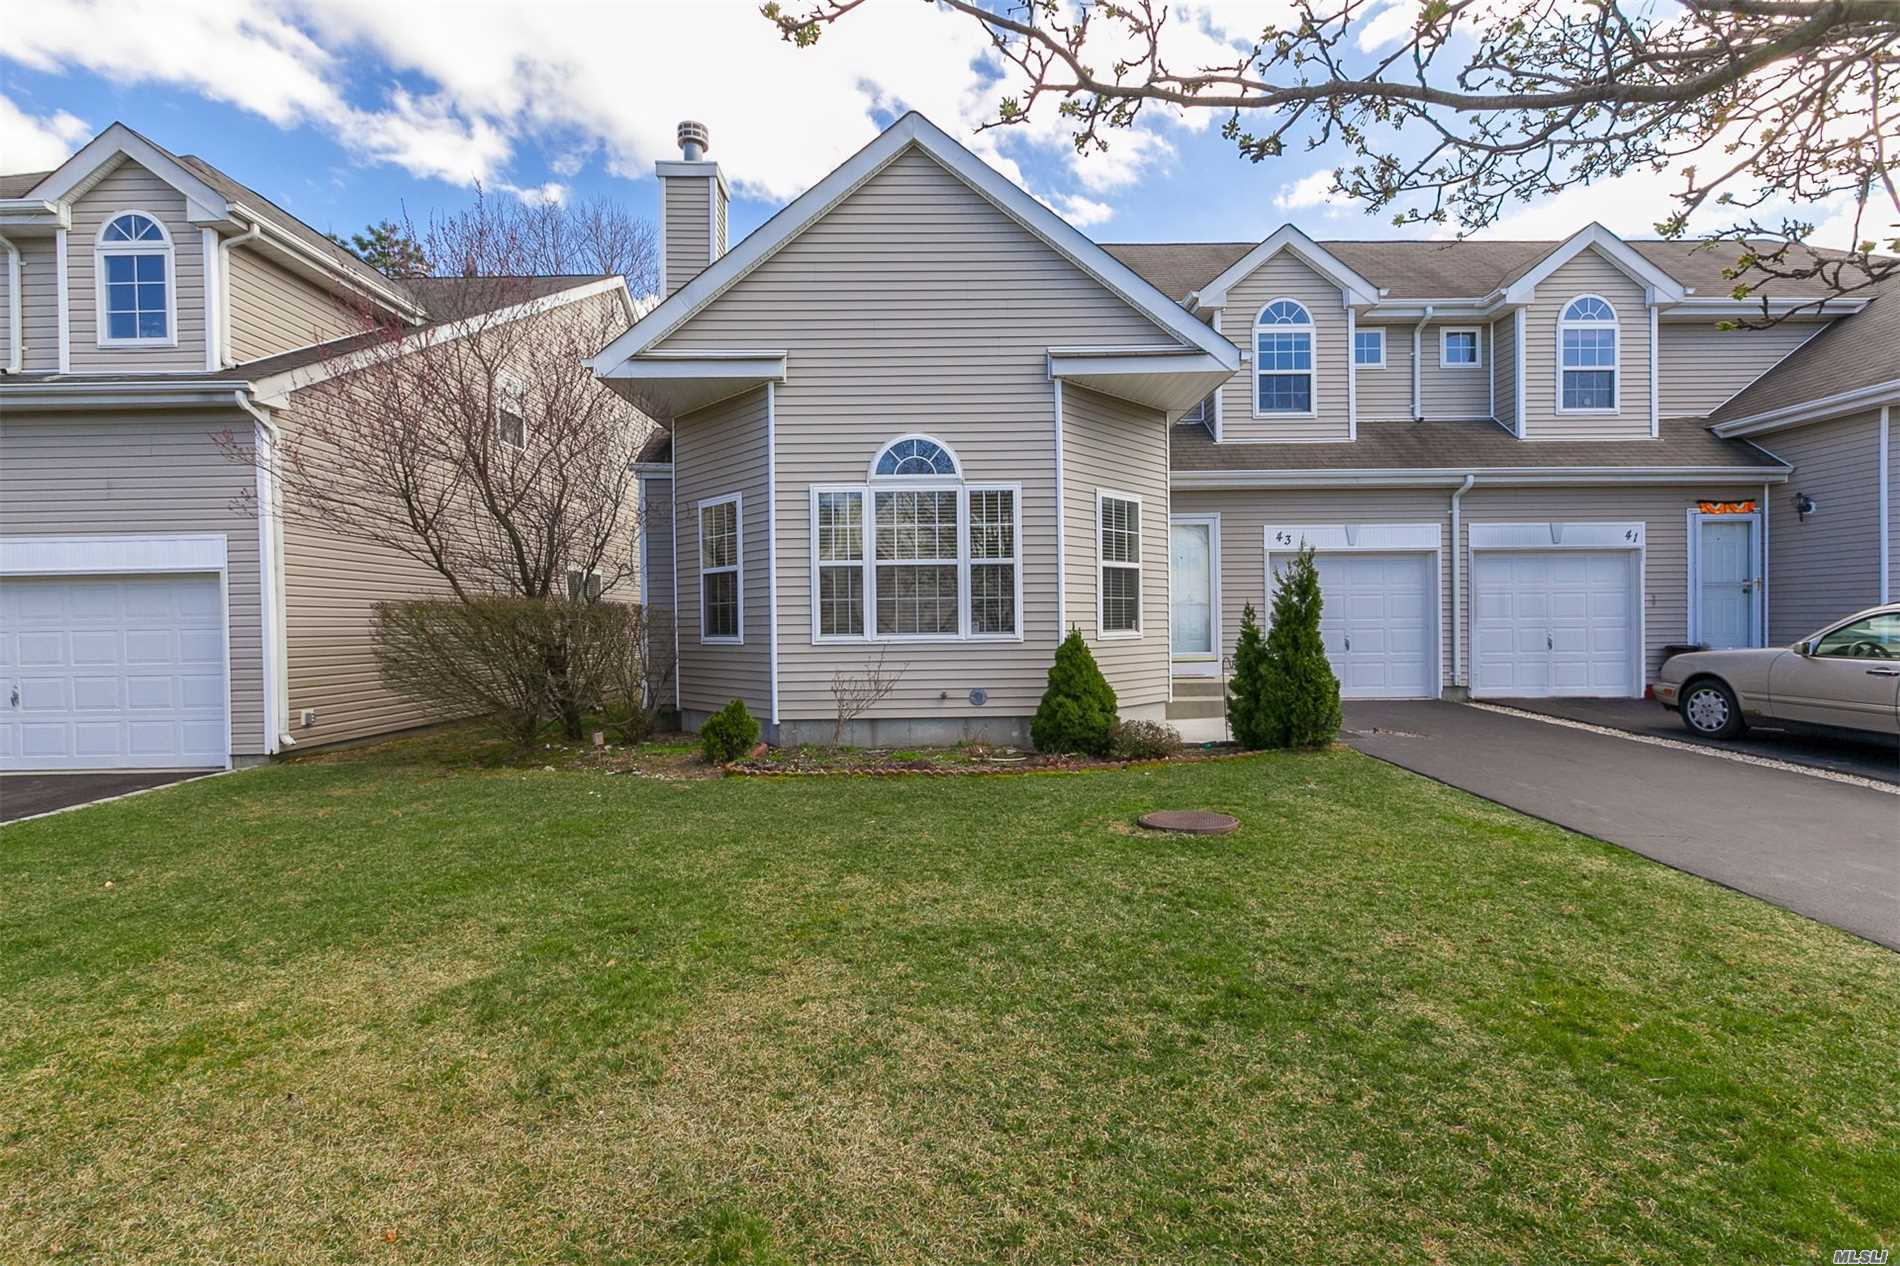 Property for sale at 43 Sunflower Ridge Rd, South Setauket,  NY 11720